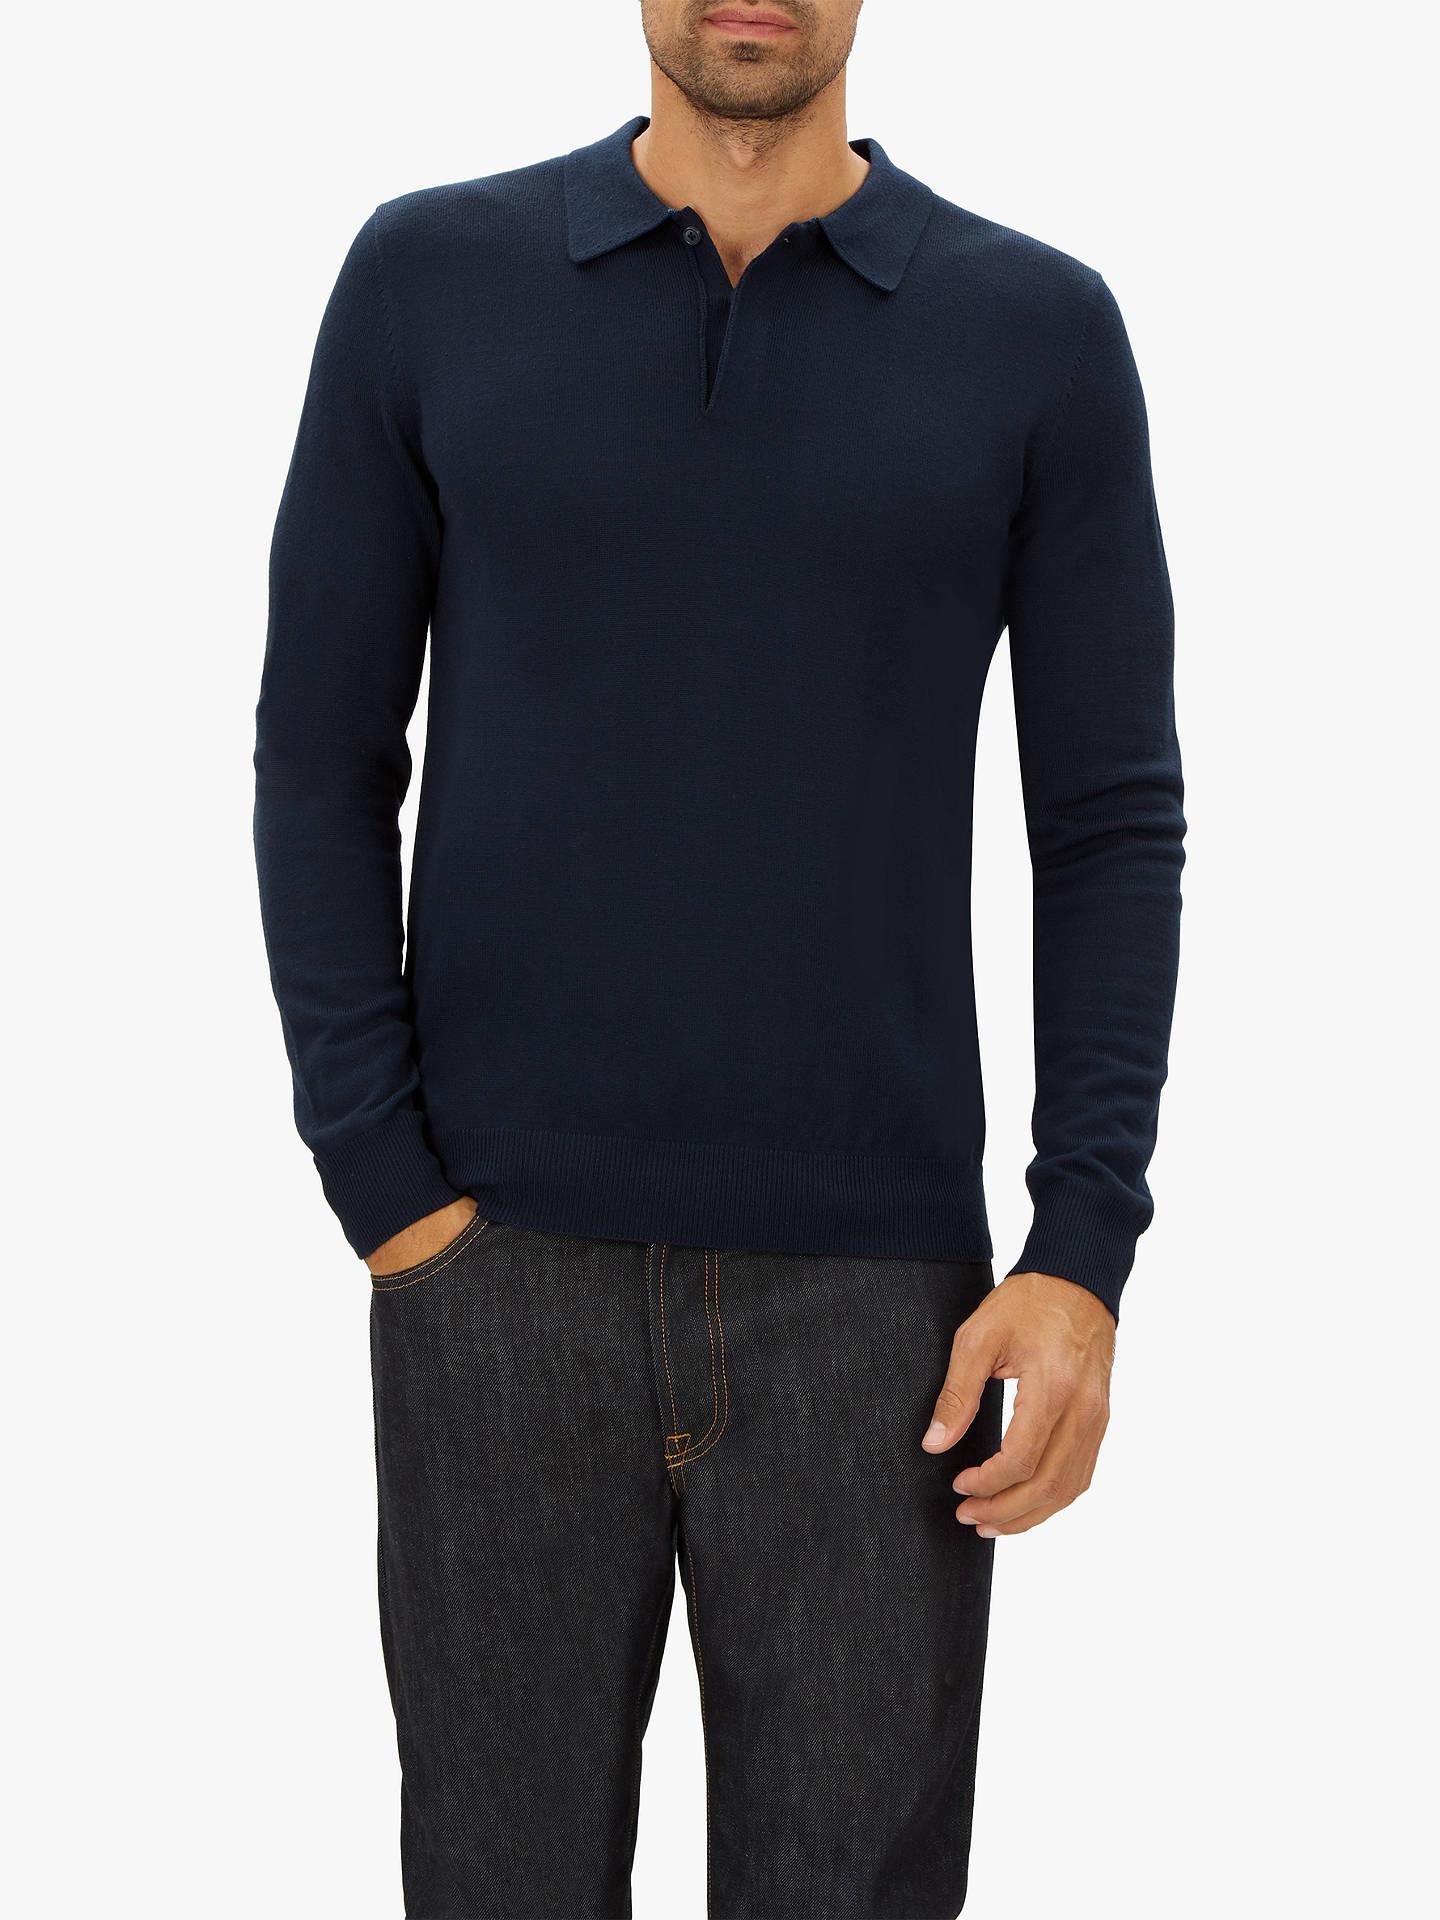 02c88770c033 Buy Jaeger Merino Wool Long Sleeve Polo Shirt, Navy, S Online at johnlewis.